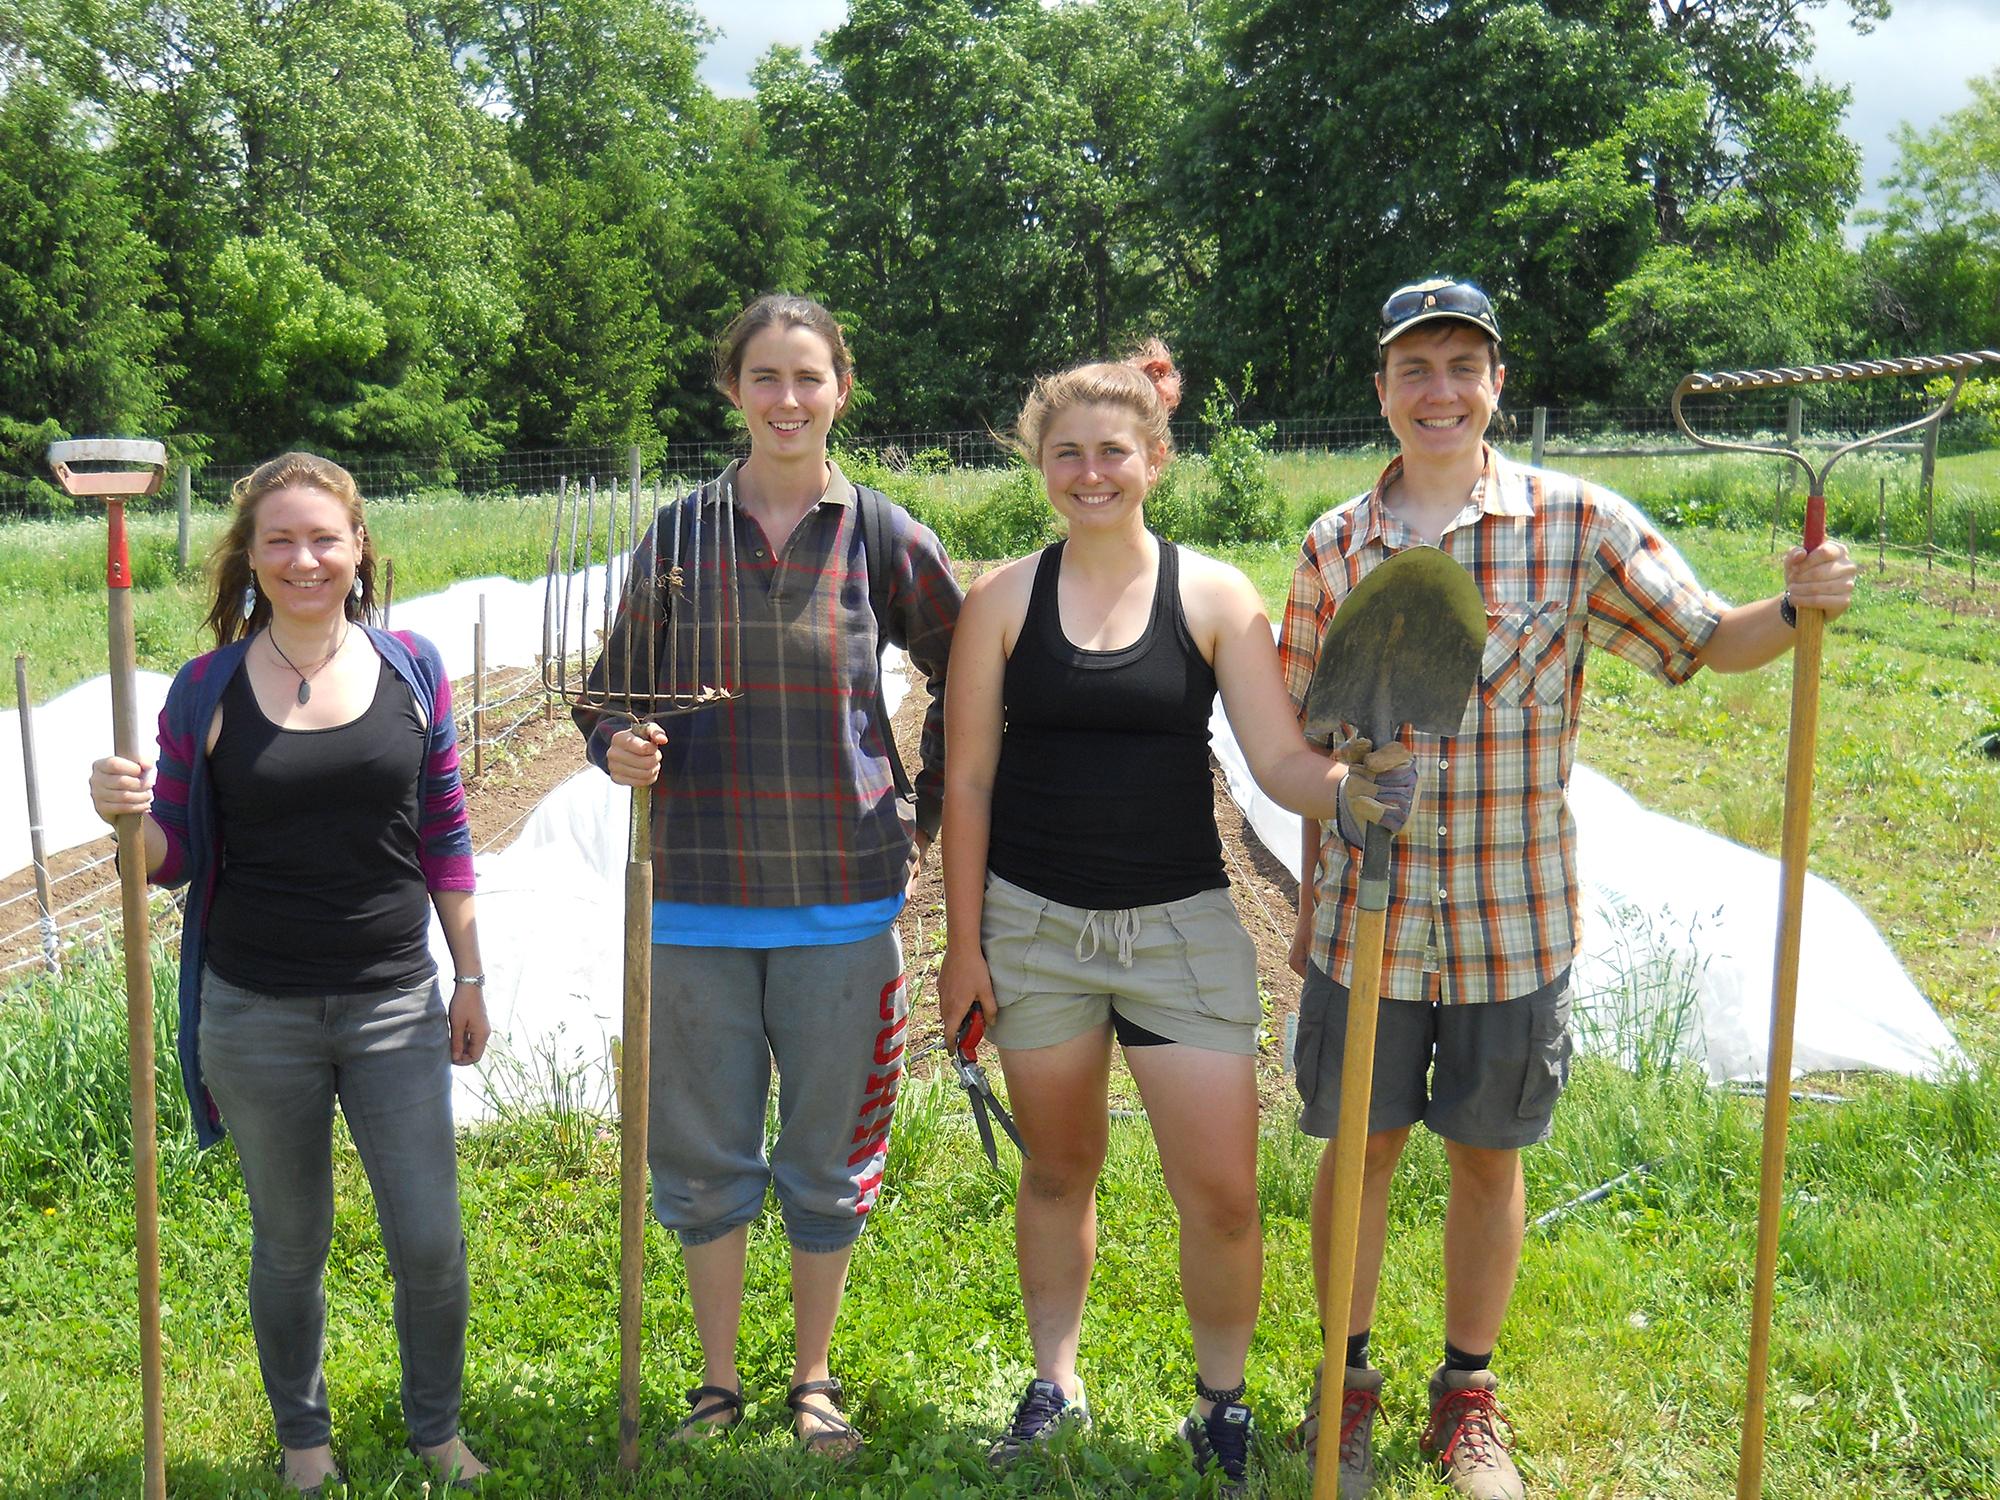 From left Hillary Joy Pitoniak, Ice Lekometros '16, Laura Kwasnoski '18 and Kelt Wilska '17.